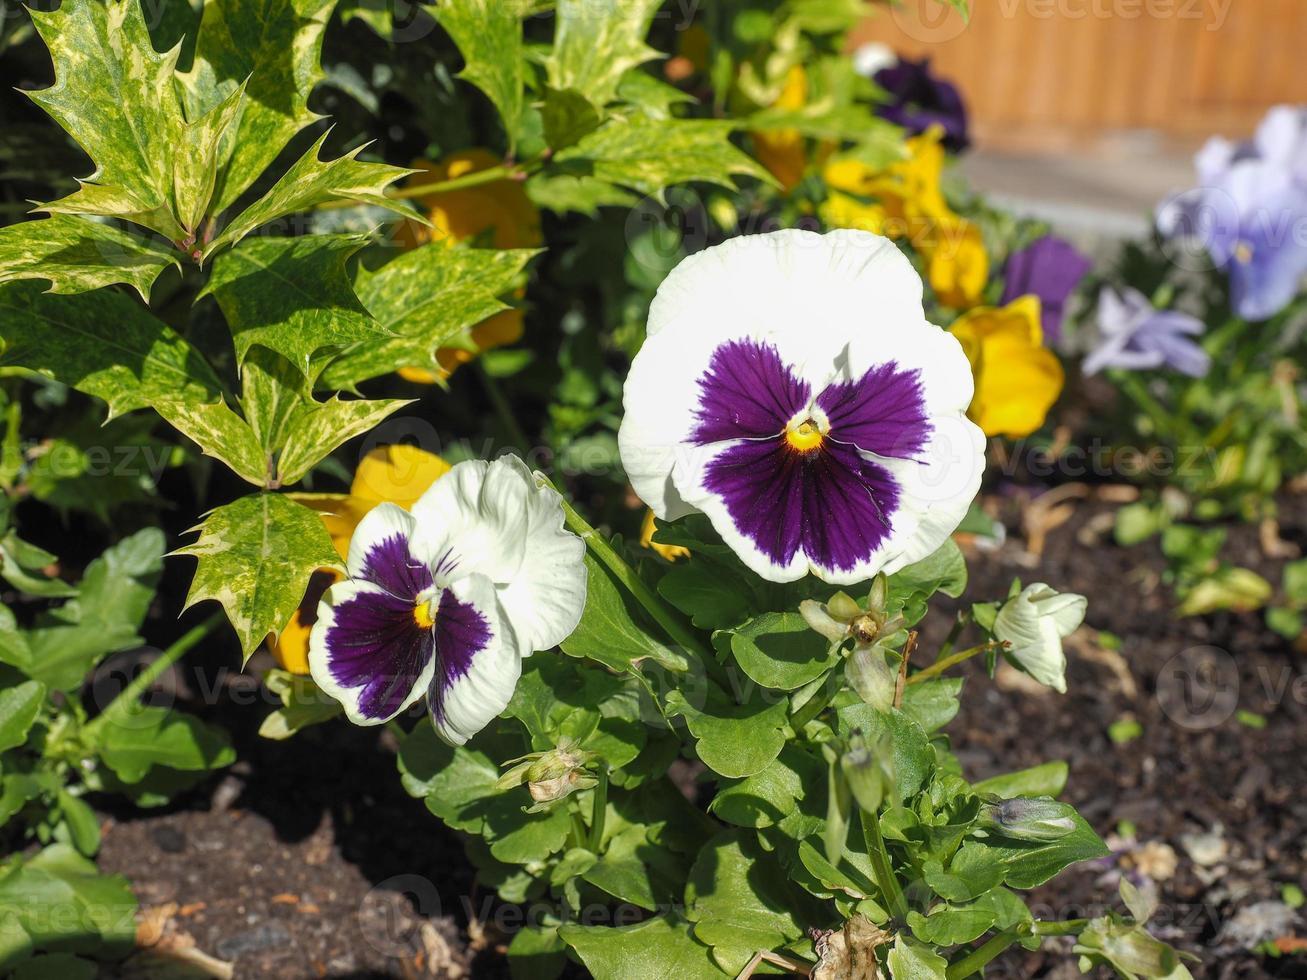 White and purple Viola flower photo